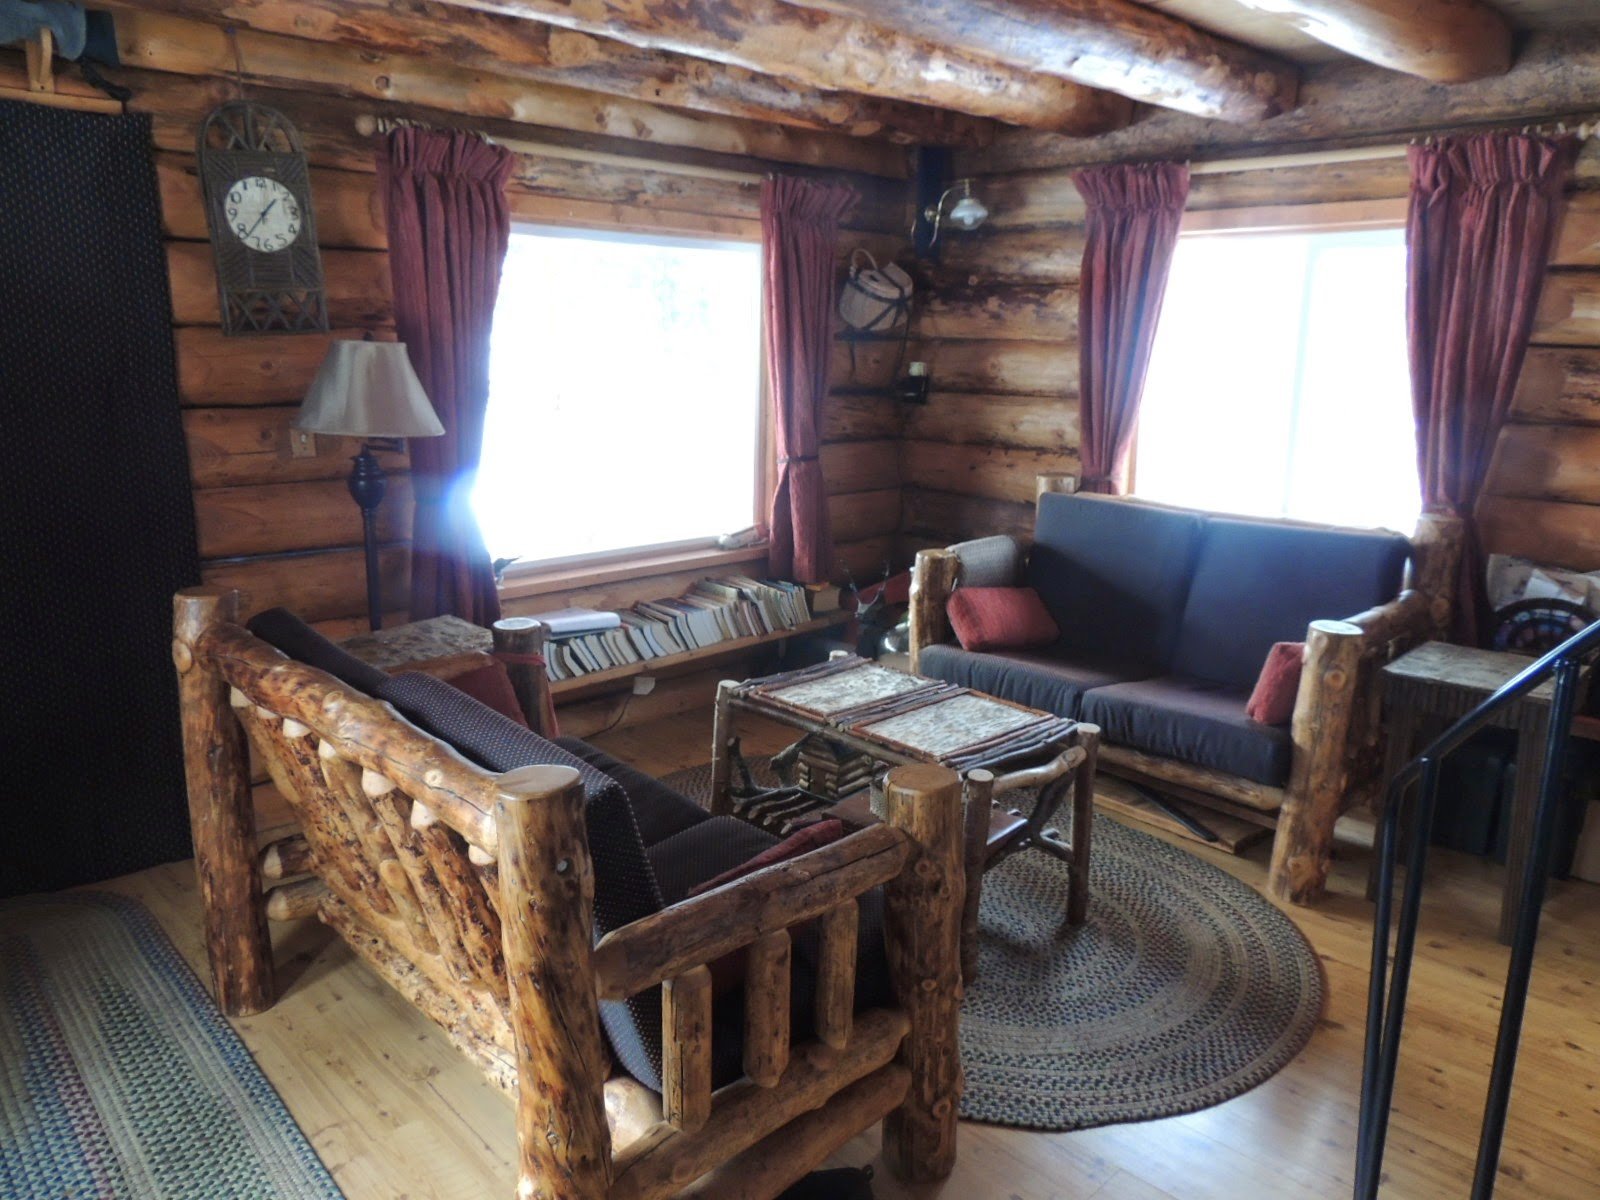 Alaska bush life off road off grid tiny house furnishings for Building a cabin in alaska